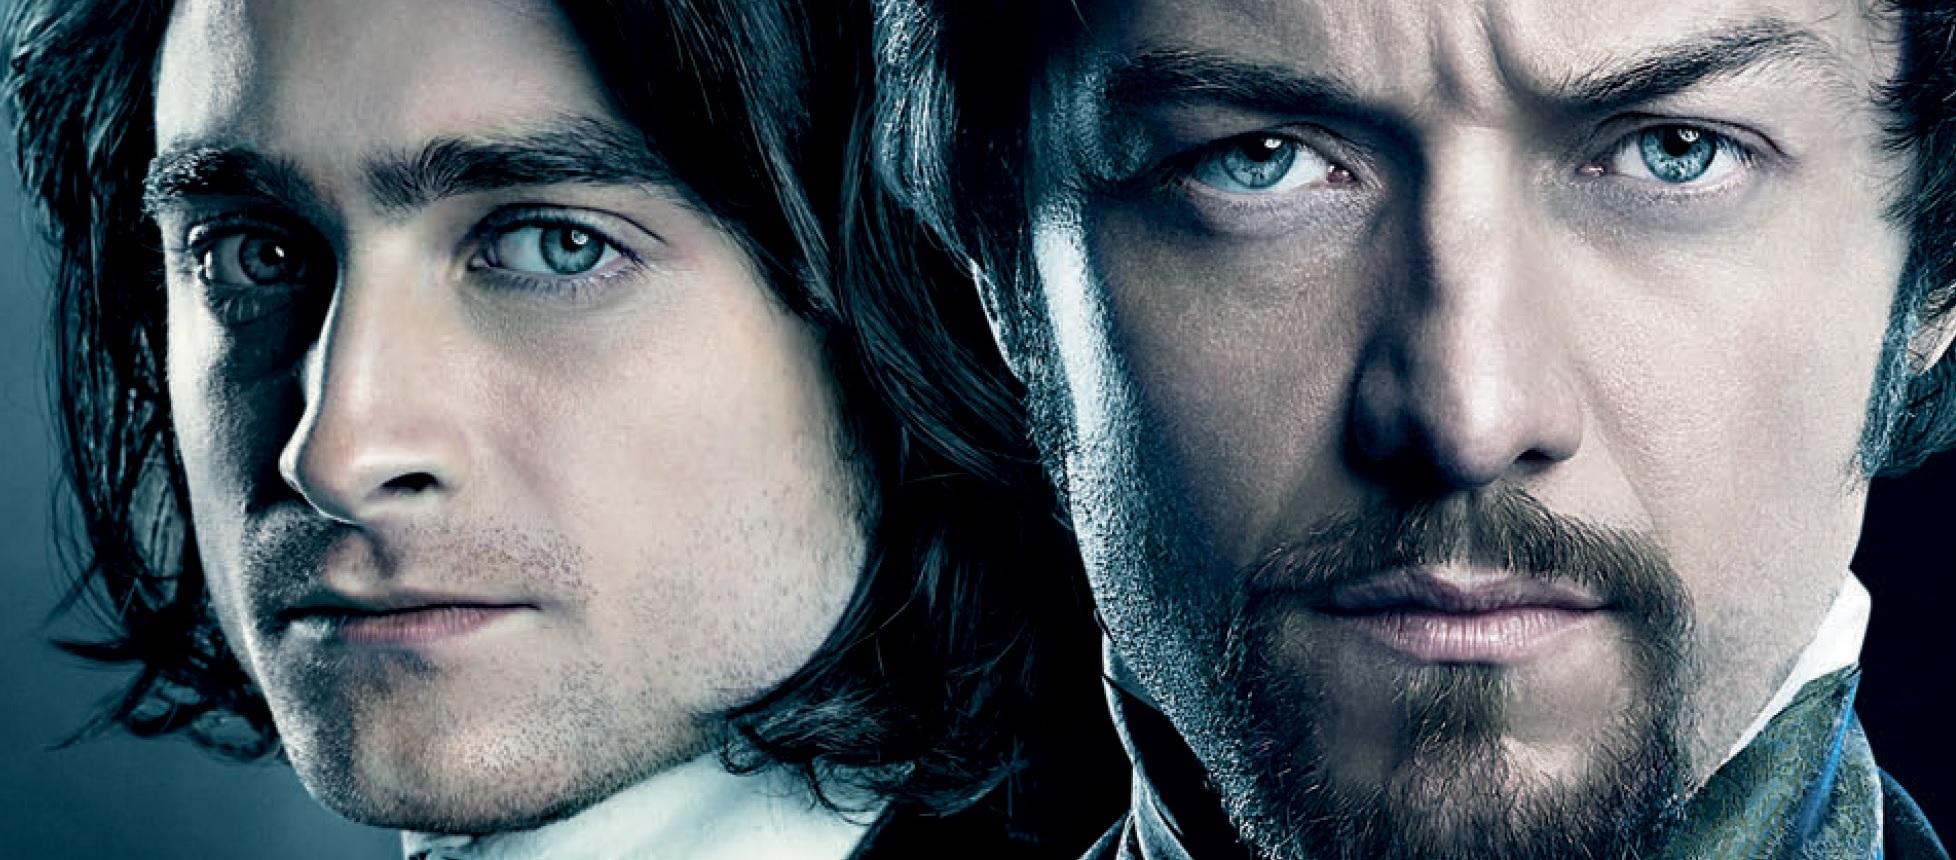 Victor-Frankenstein-Poster-UK-Daniel-Radcliffe-James-McAvoy-slice